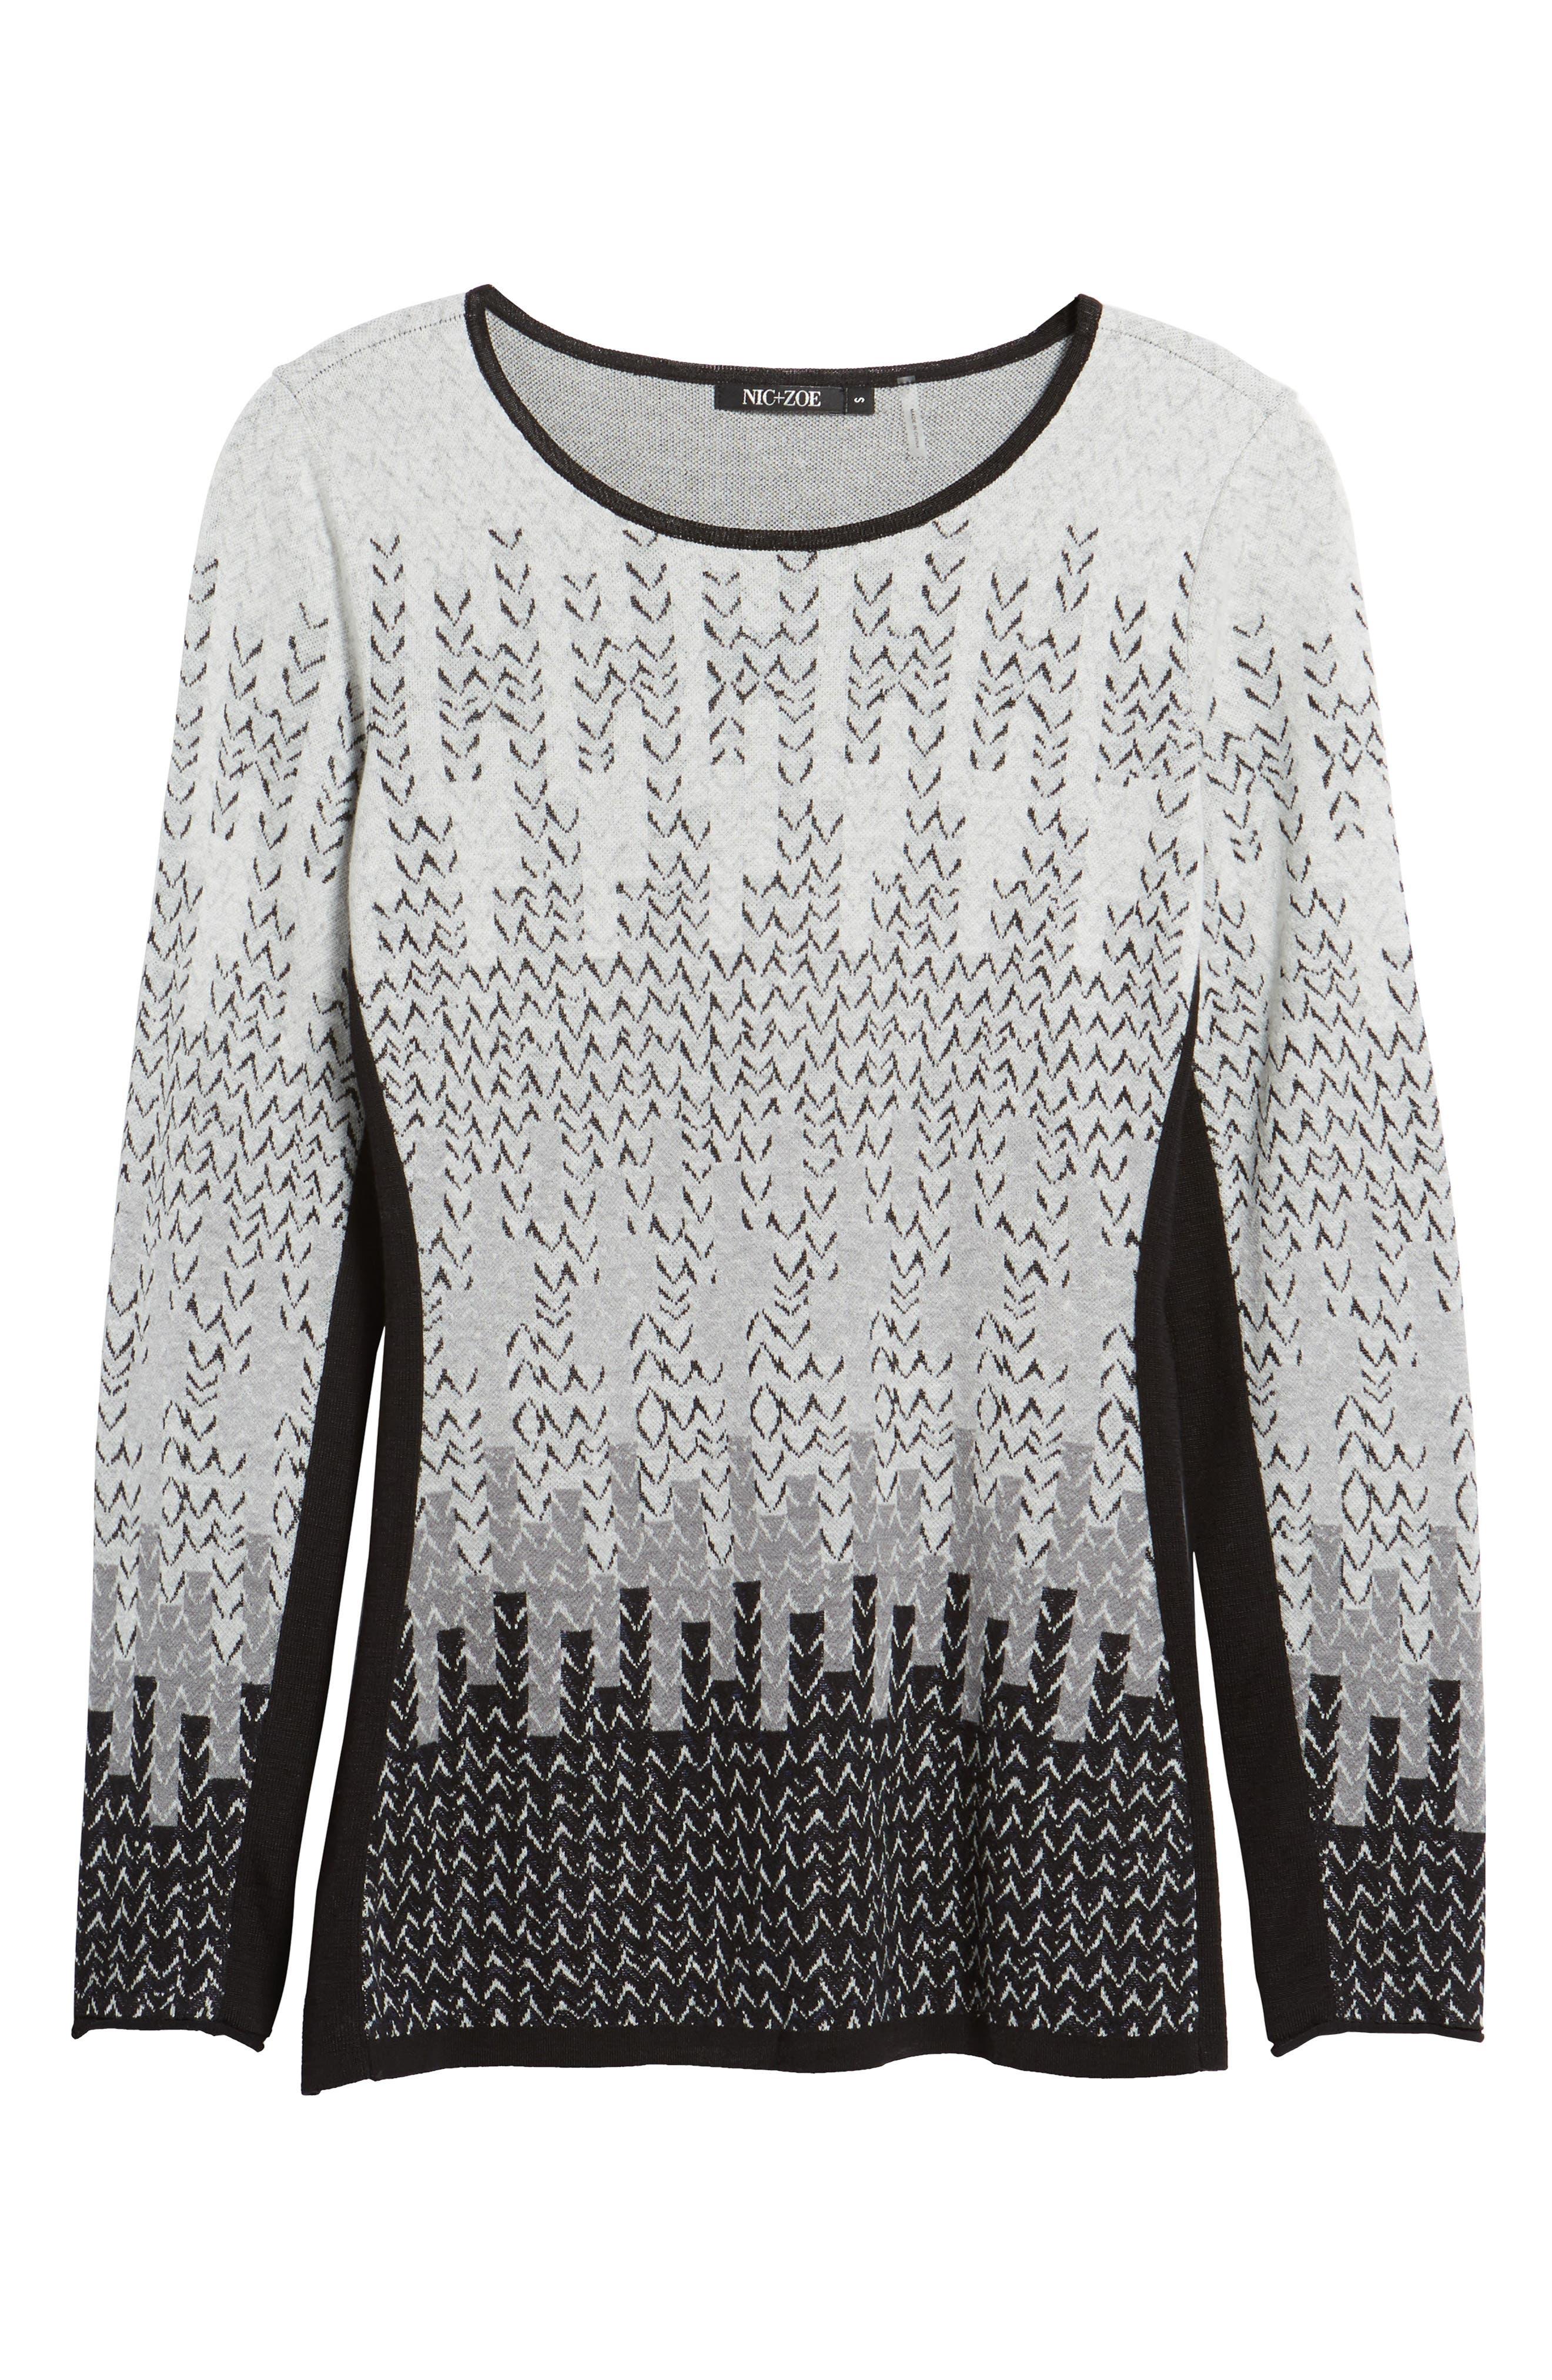 Sunset Sweater,                             Alternate thumbnail 6, color,                             027